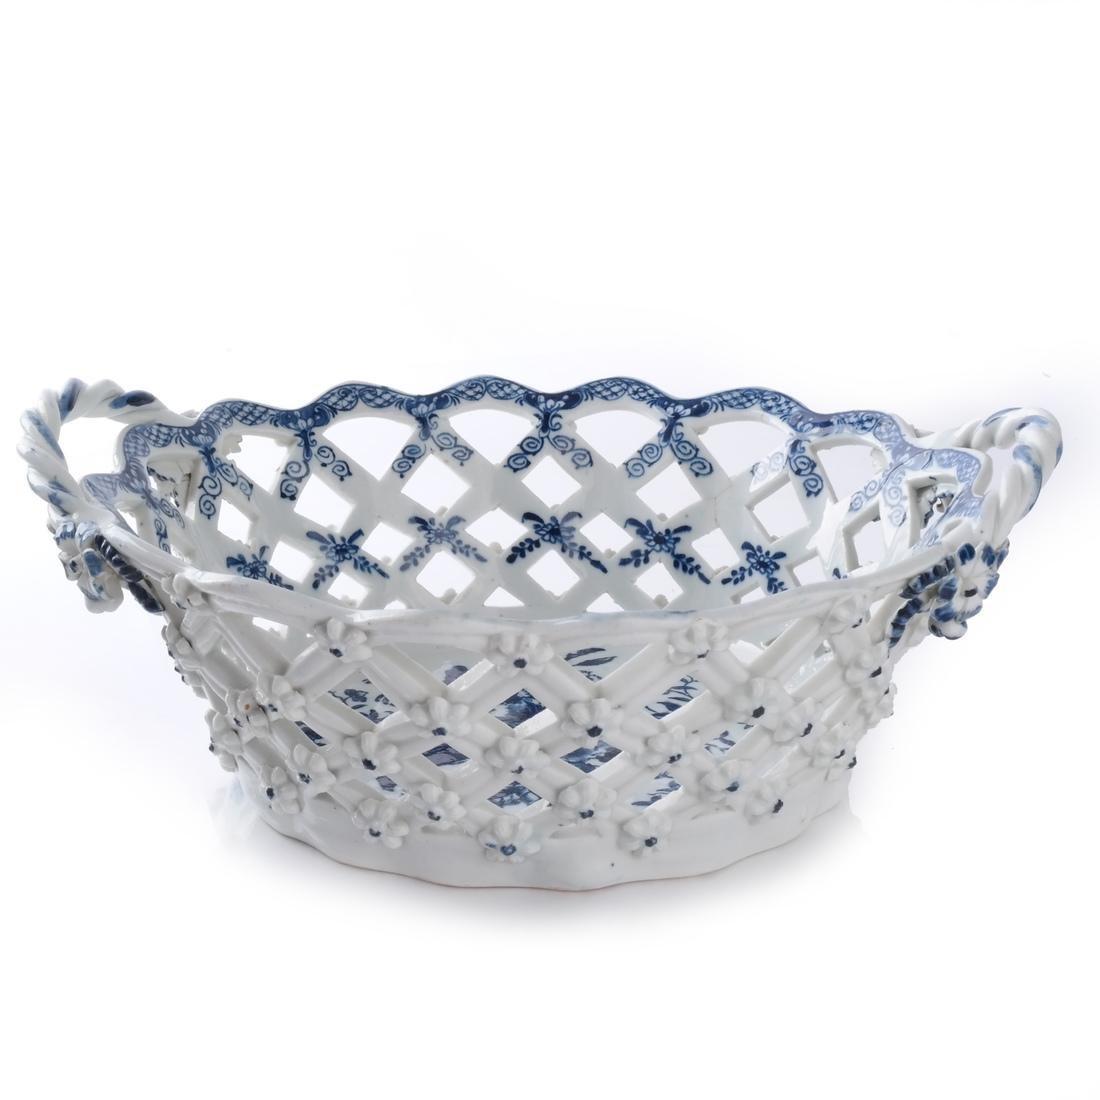 Two 18th C. English Porcelain Baskets - 5